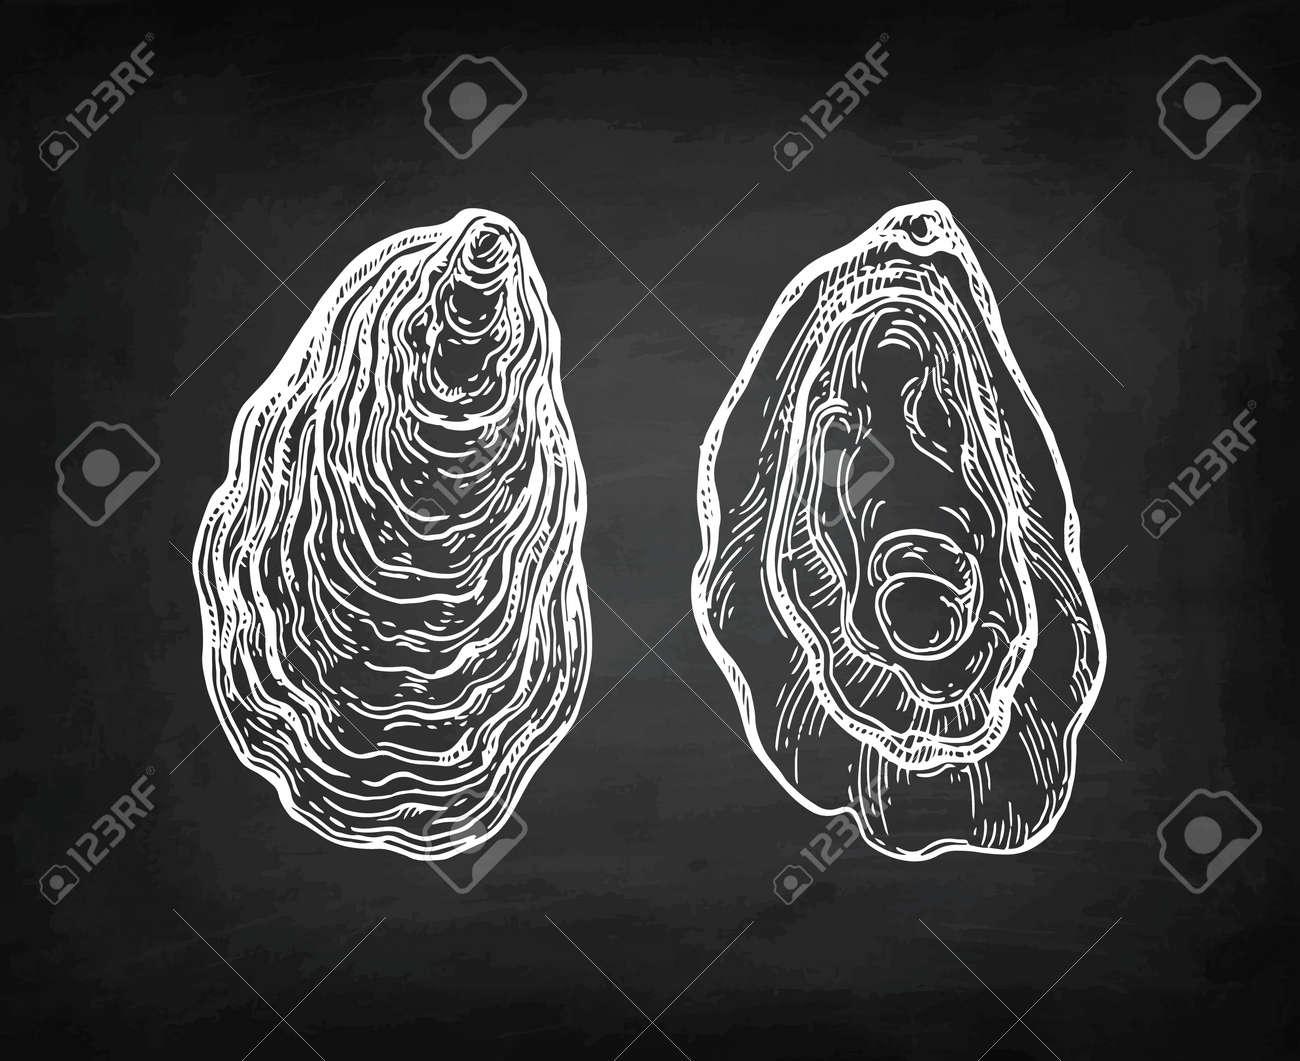 Oysters chalk sketch. - 87113881